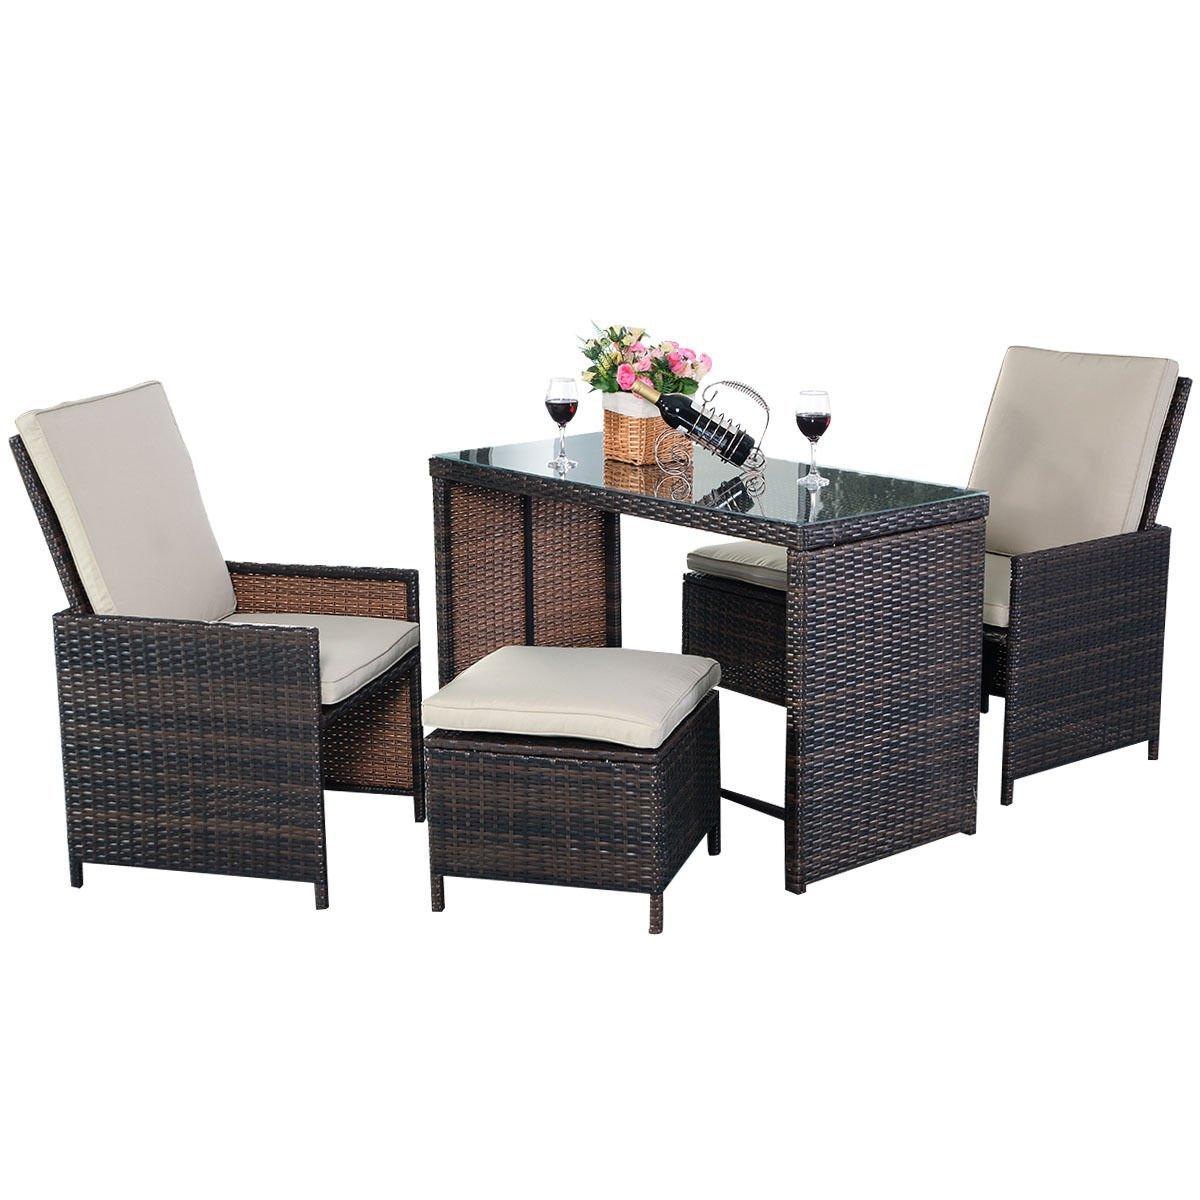 Amazon.com: Tangkula 5PCS Brown Cushioned Ottoman Rattan Patio Set Outdoor  Furniture Garden: Garden U0026 Outdoor